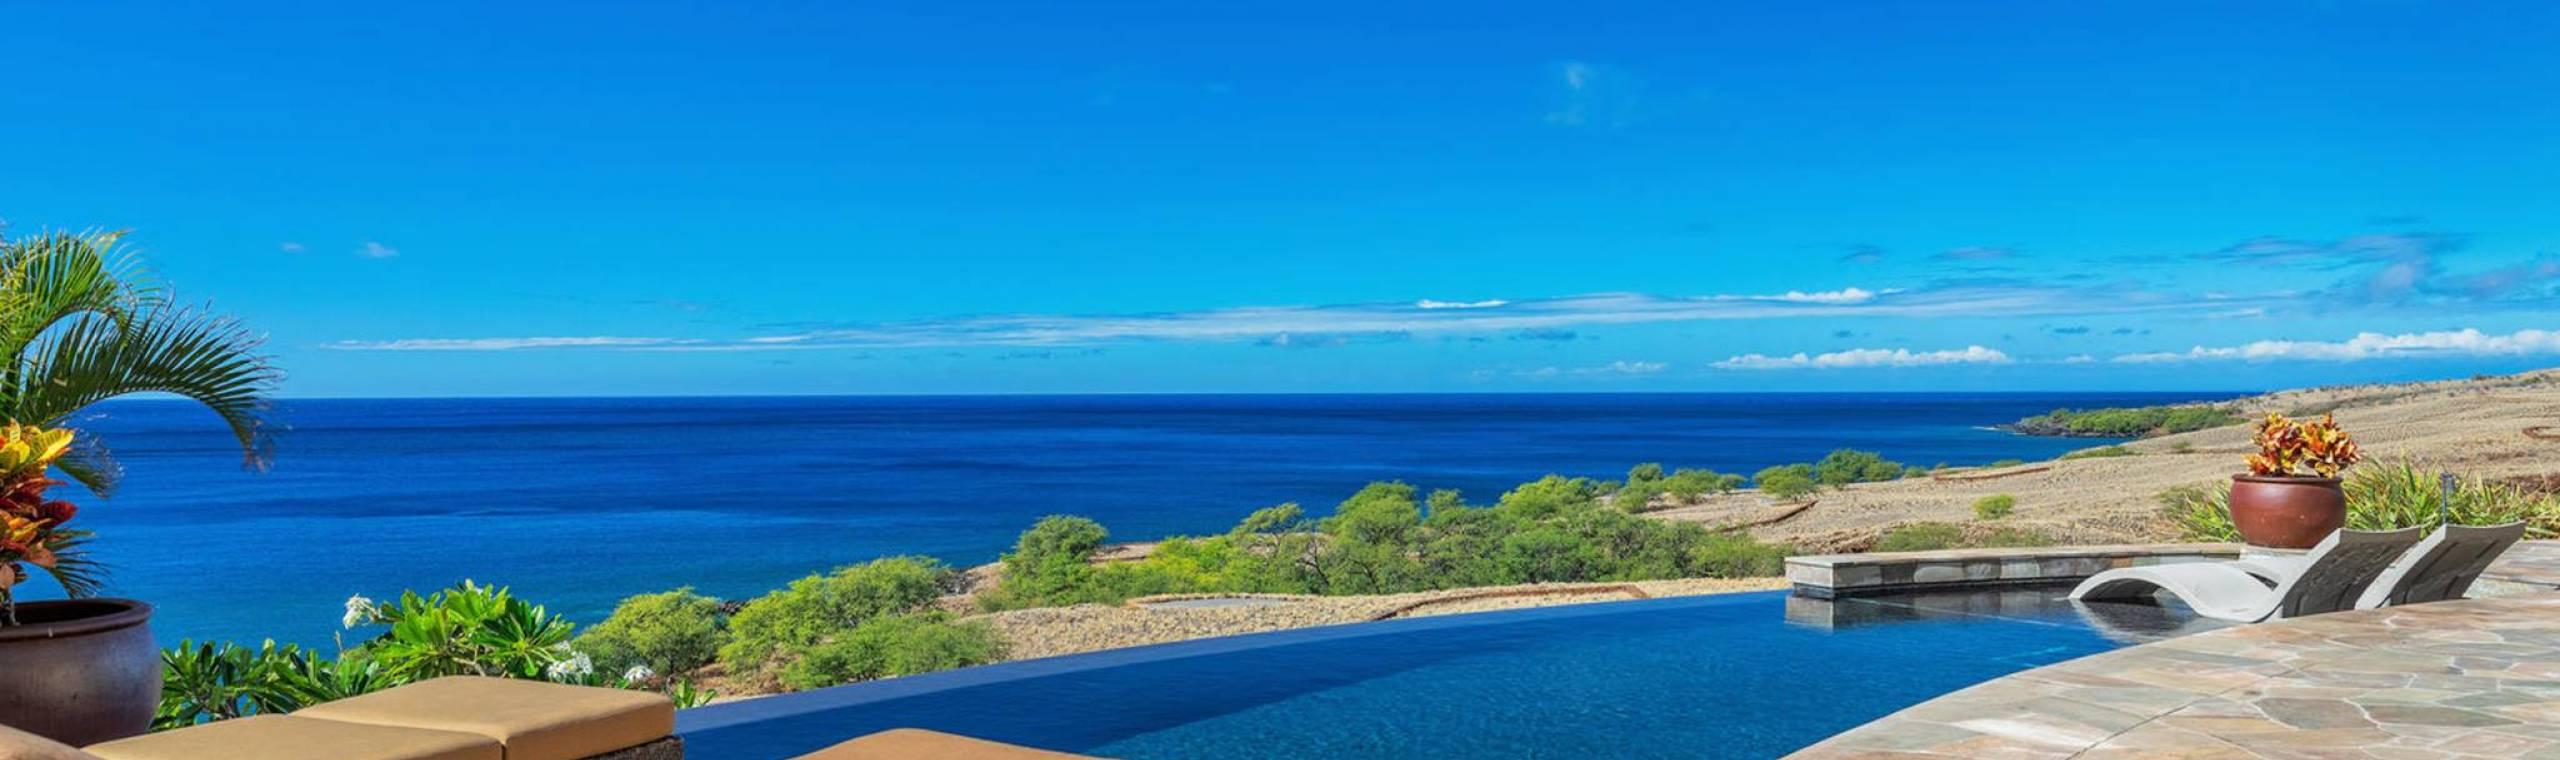 Kohala Coast Vacation Rental